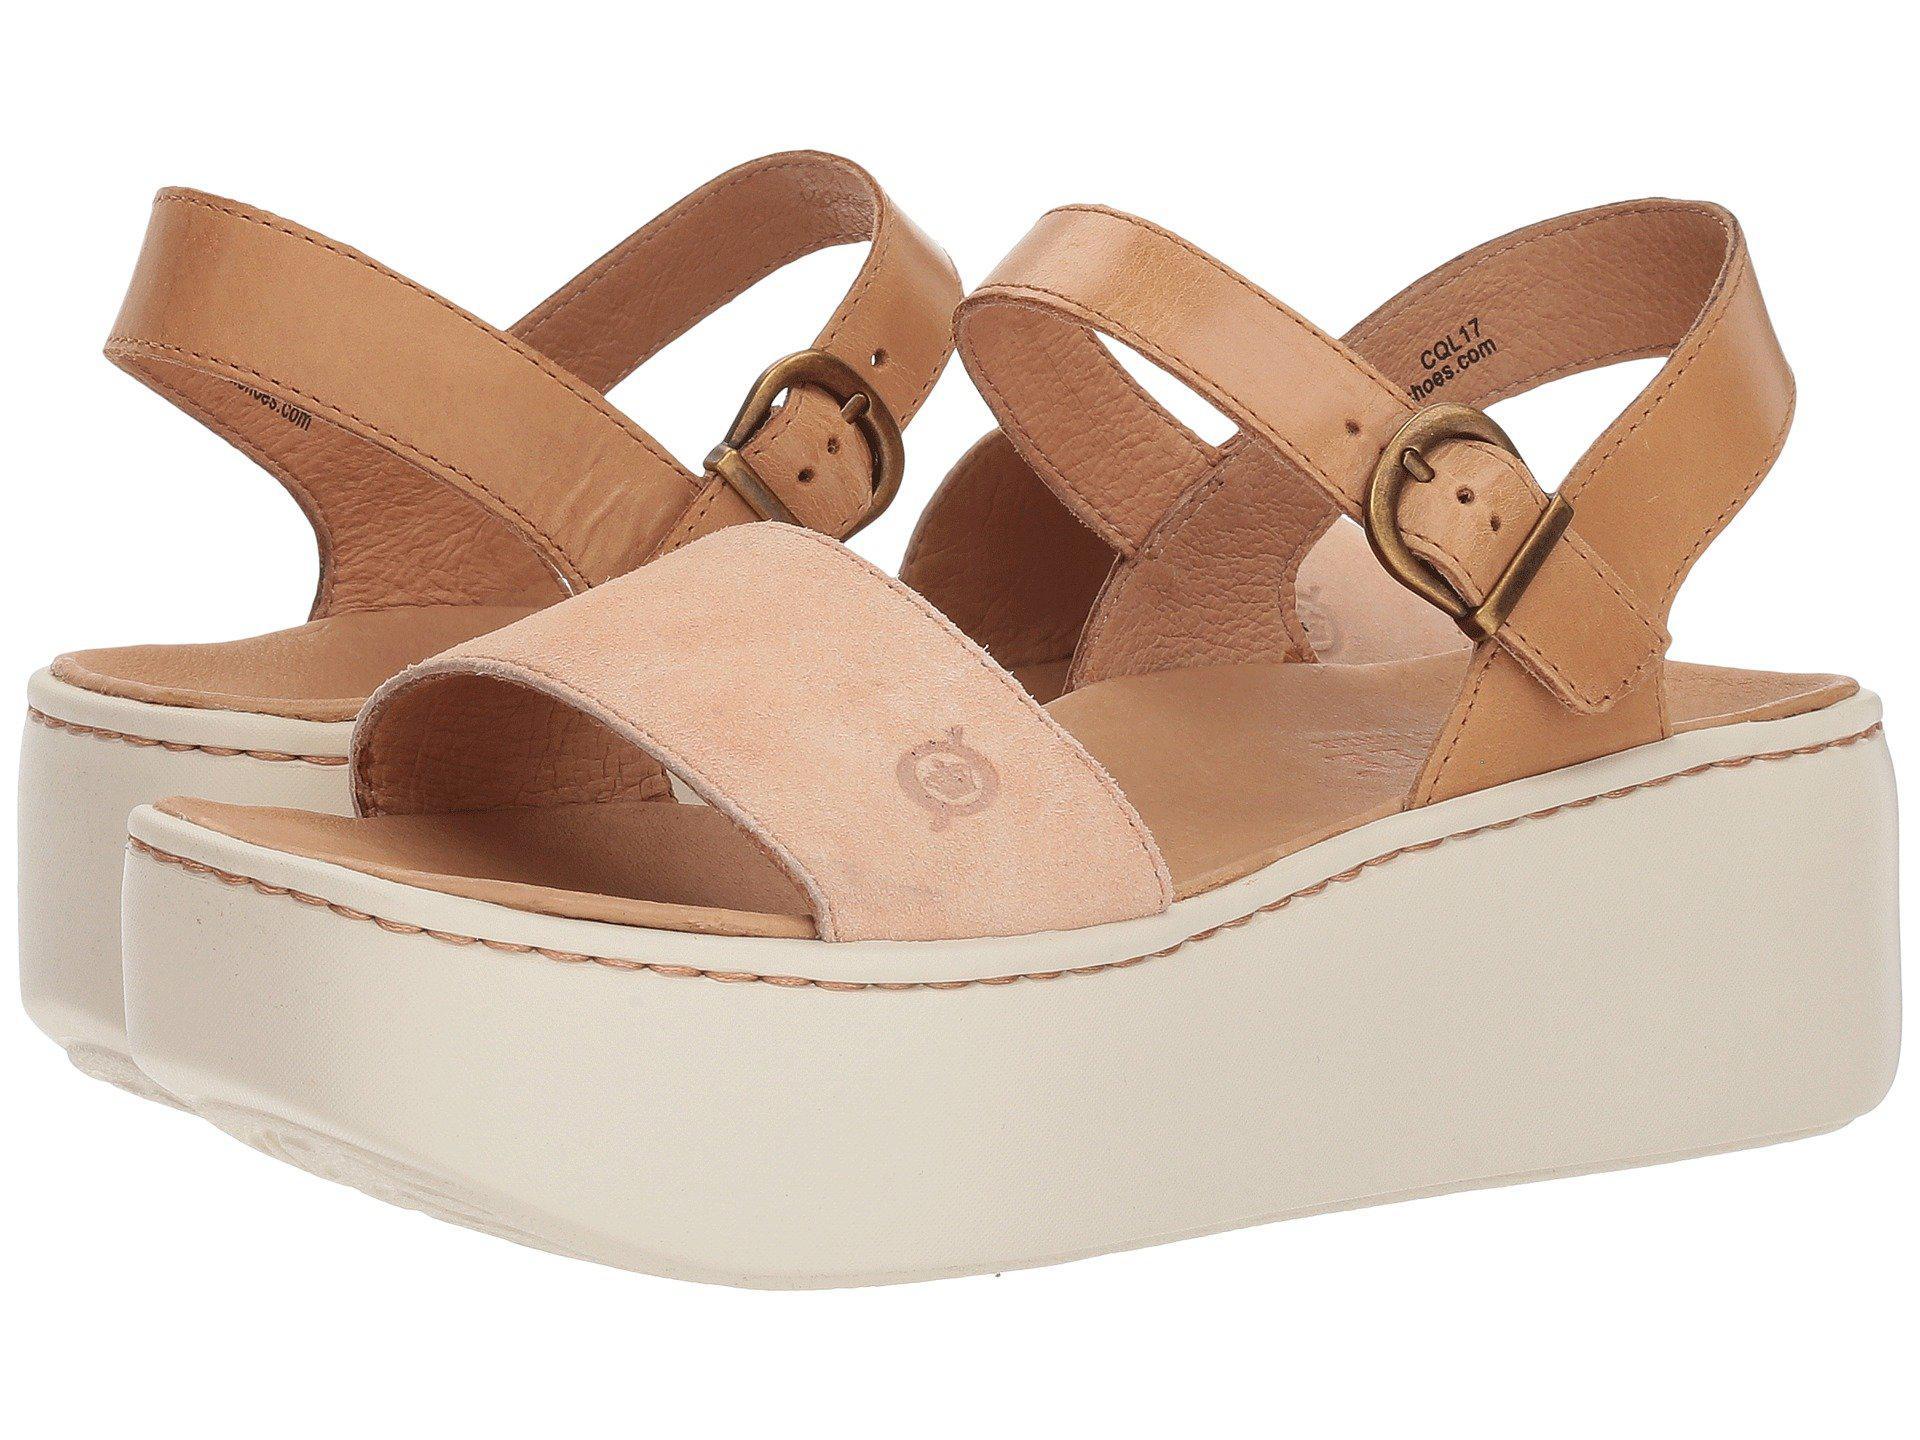 e9a13a4caa40 Lyst - Born Breaker (orange tan Combo) Women s Wedge Shoes